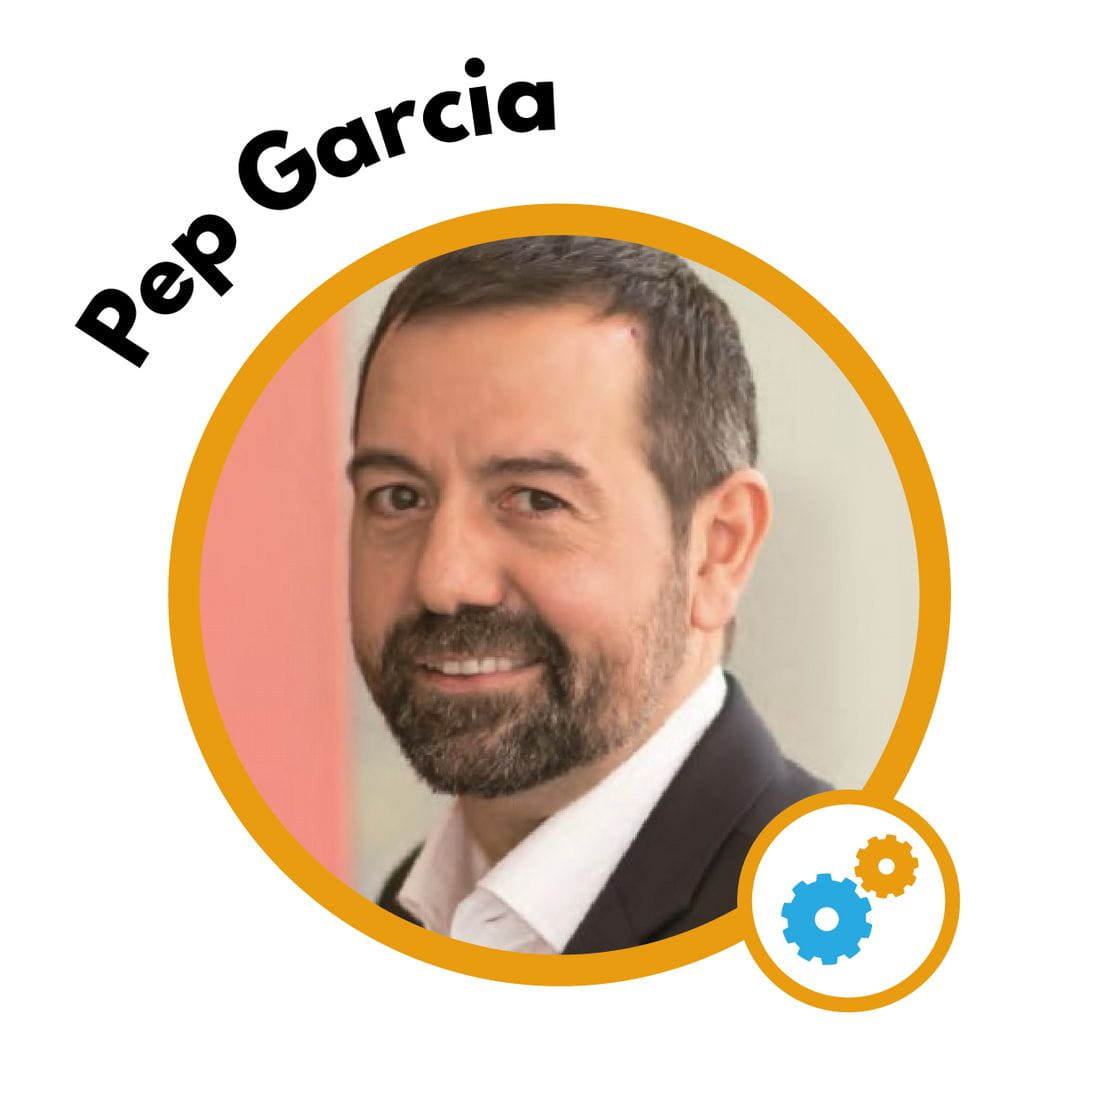 Pep Garcia - Creativation Talks 2018